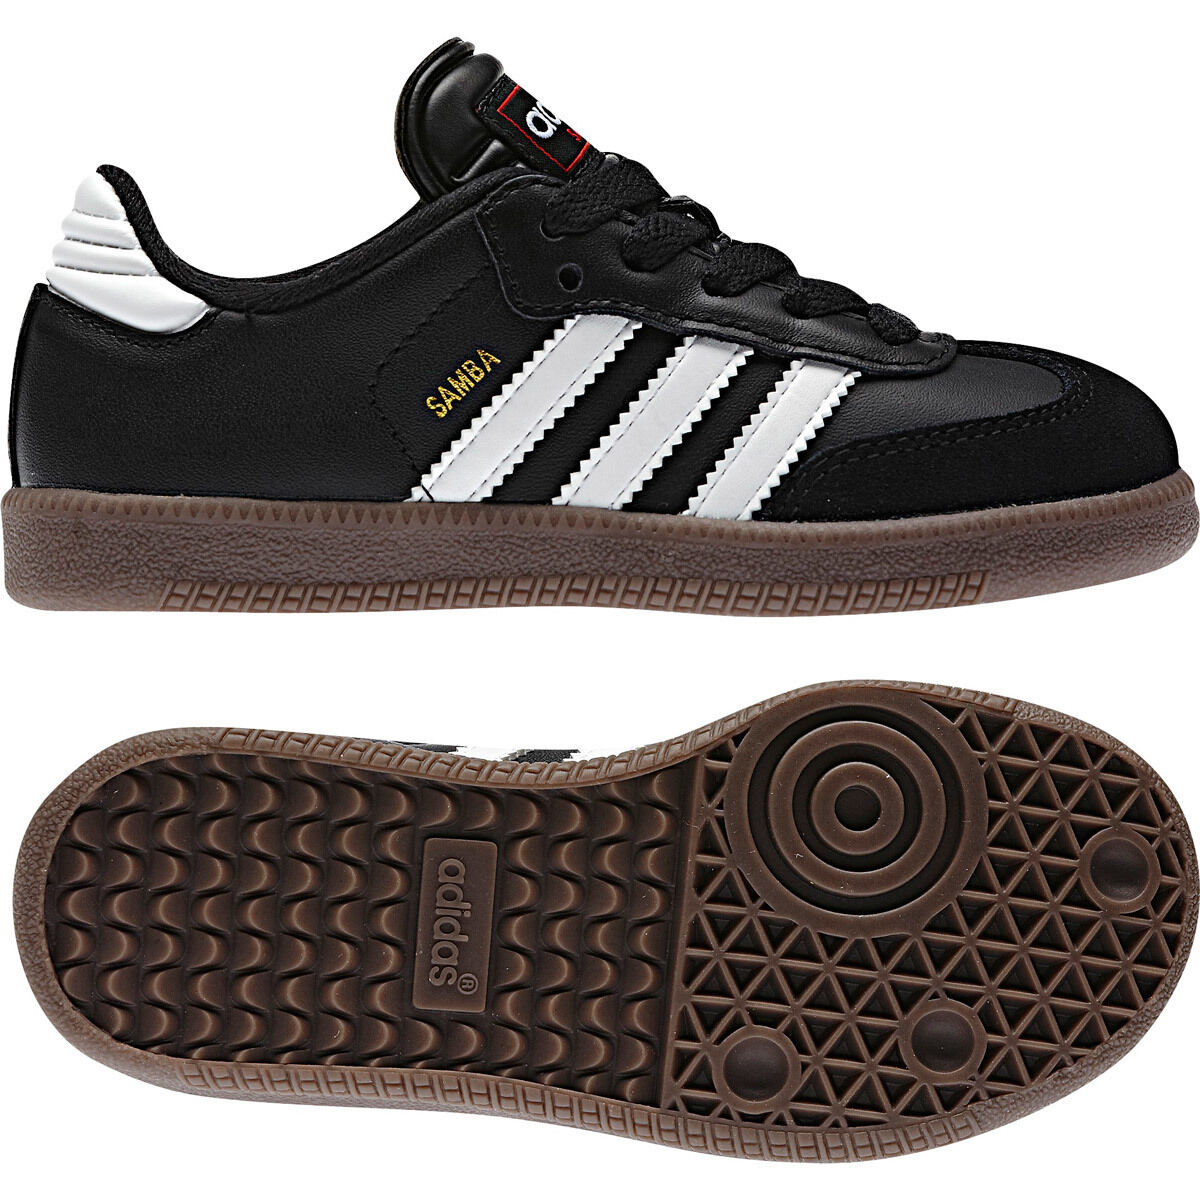 Adidas Samba Clásico Negro Talla 8 Nuevo